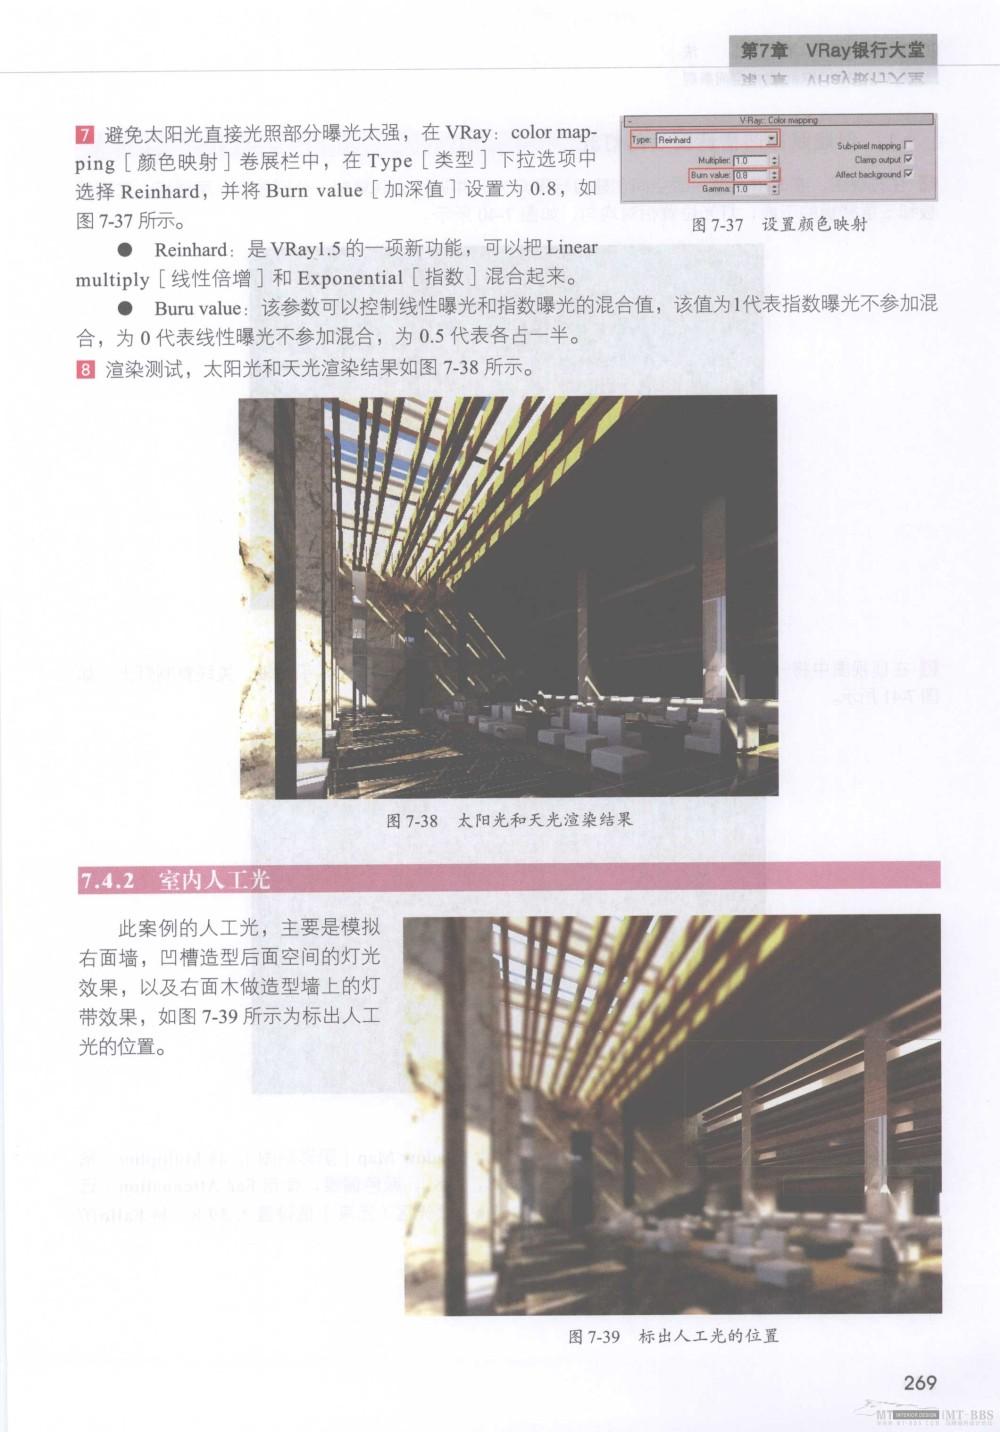 水晶石技法-3ds_Max&VRay室内空间表现_水晶石技法-3ds_Max&VRay室内空间表现_页面_275.jpg